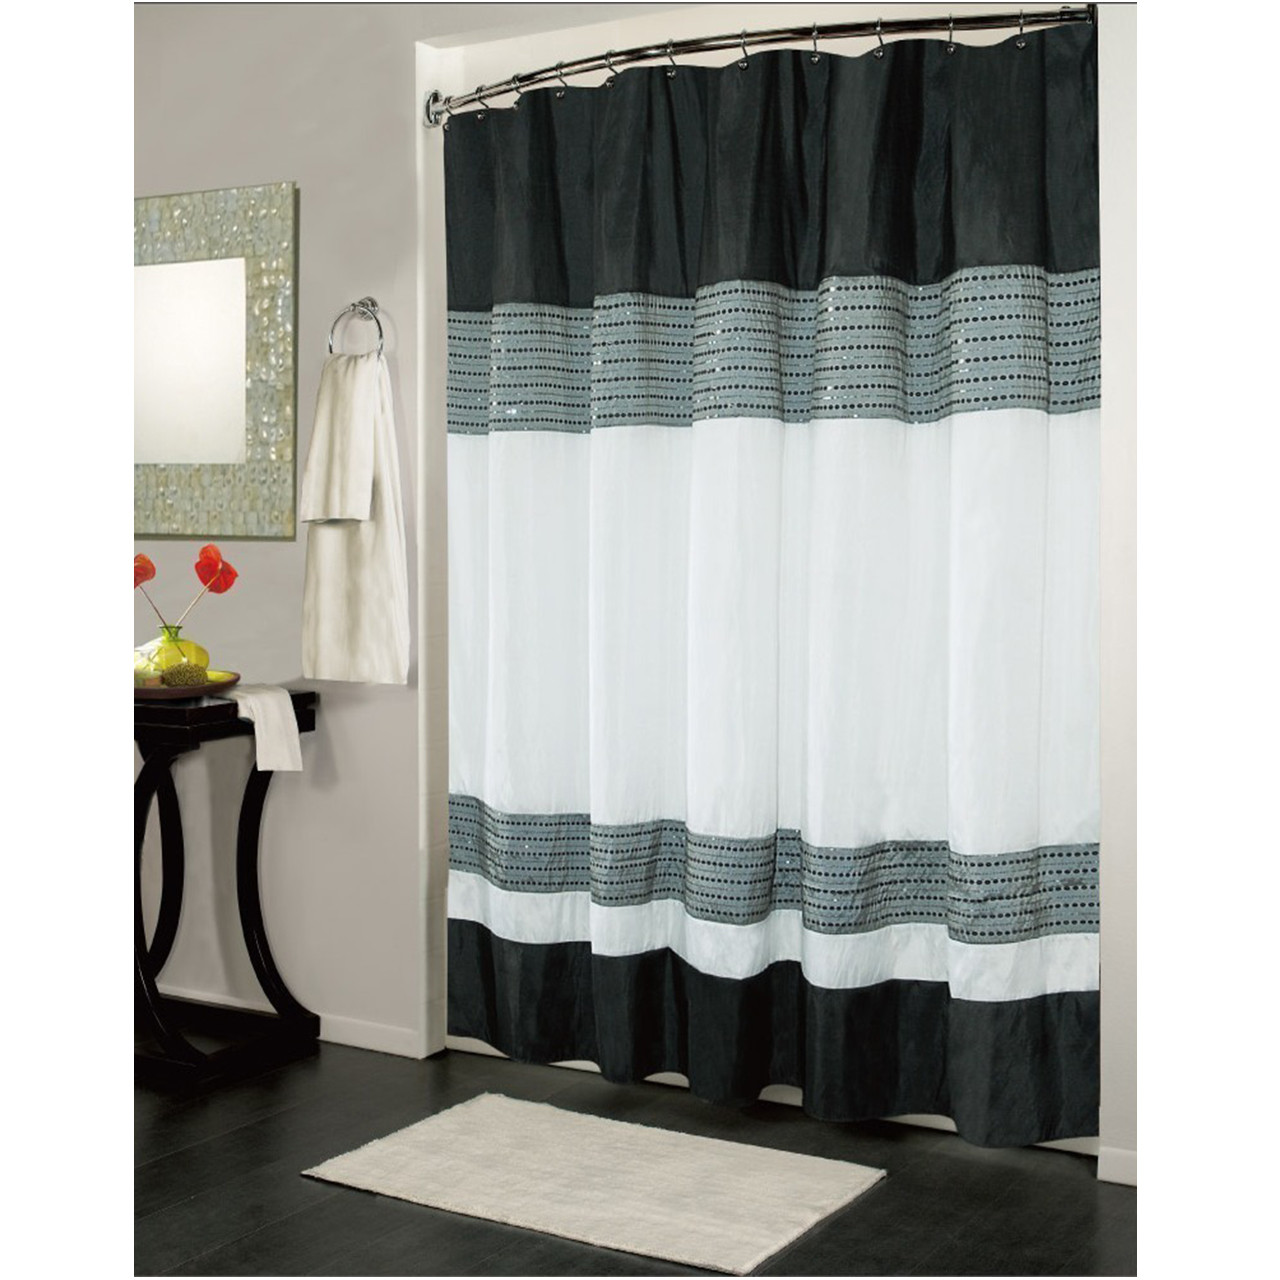 Ibiza Striped Sequin Accents Black White Shower Curtain